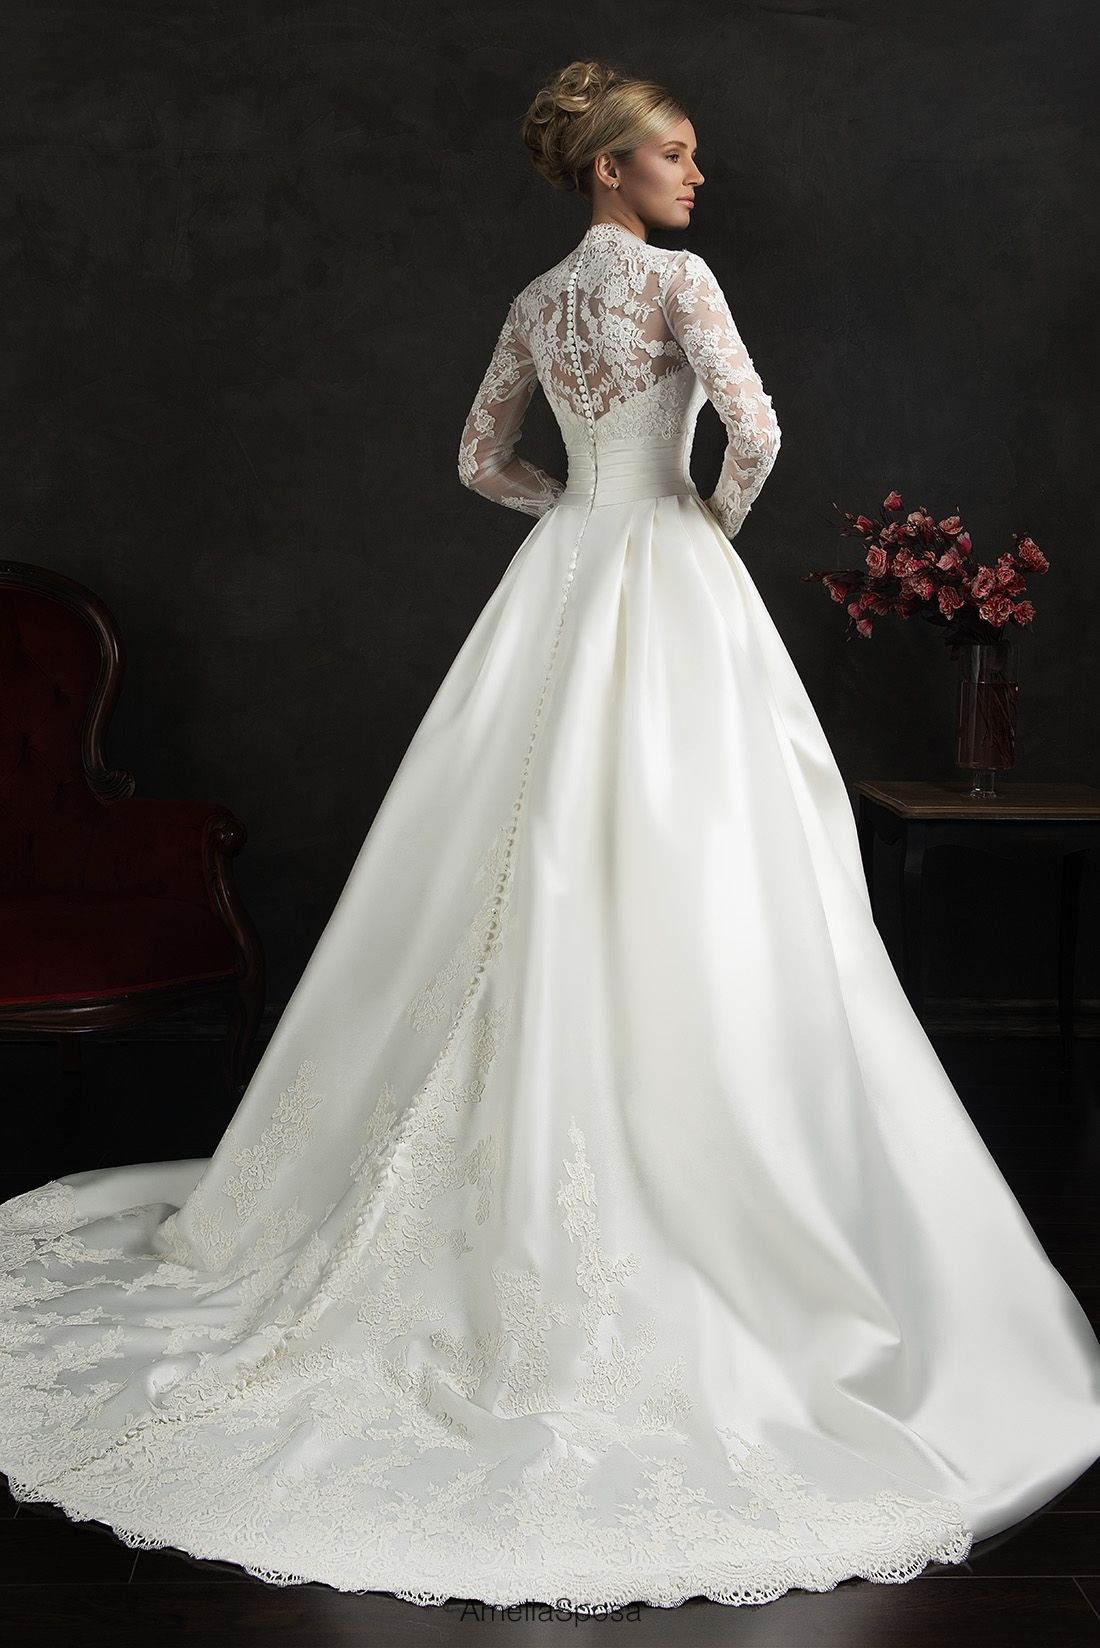 Pin by carol oakes on wedding dresses pinterest wedding dress